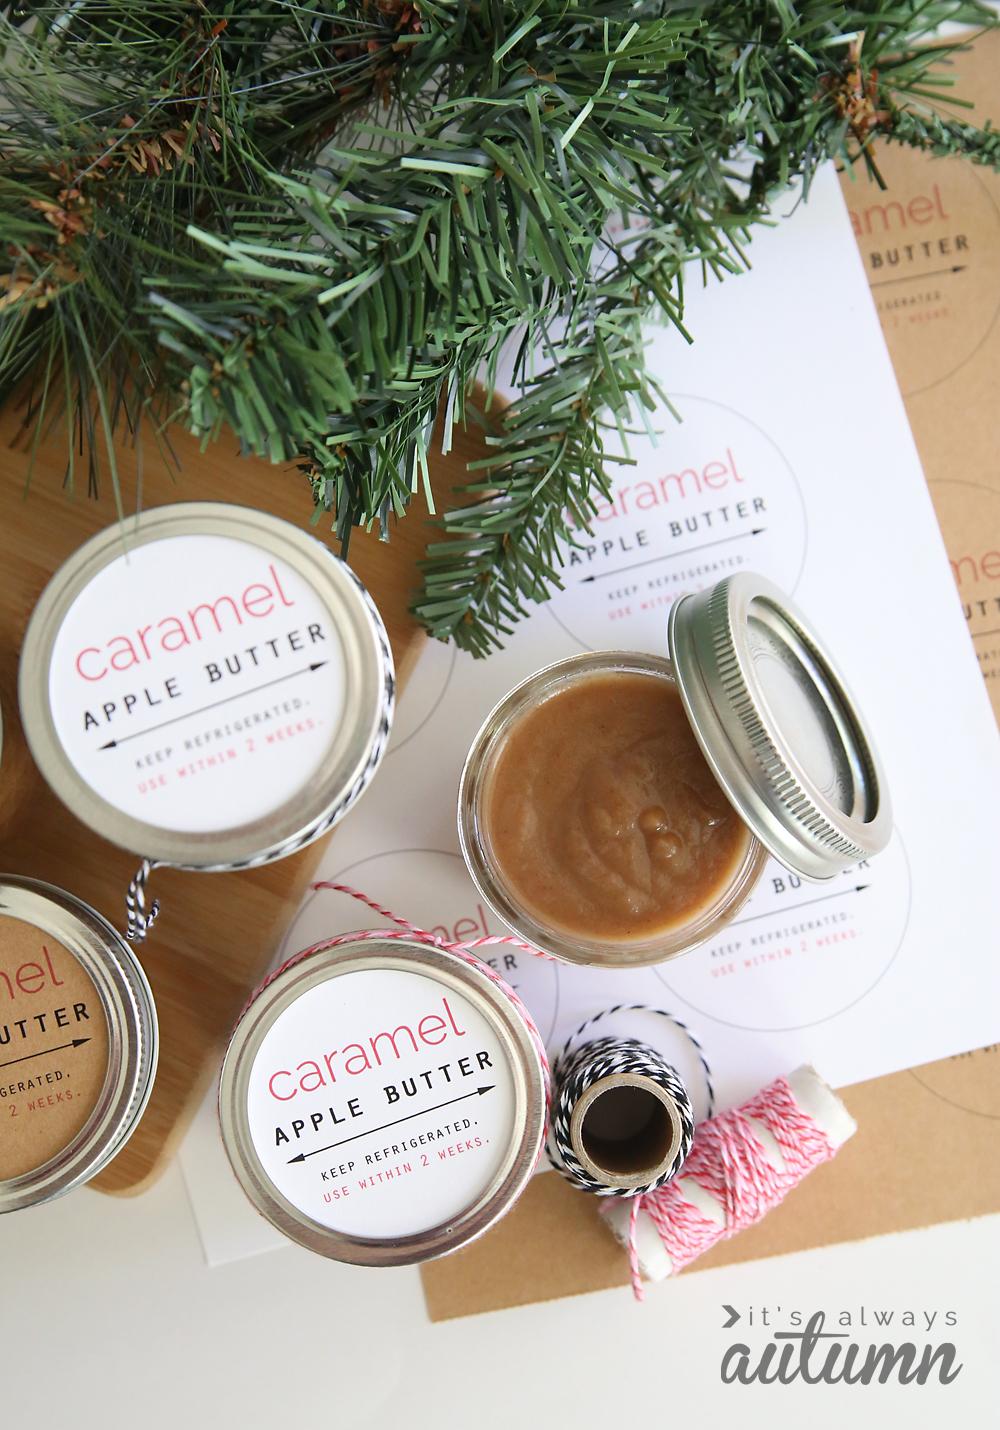 crockpot caramel apple butter | DIY gift idea - It's ...